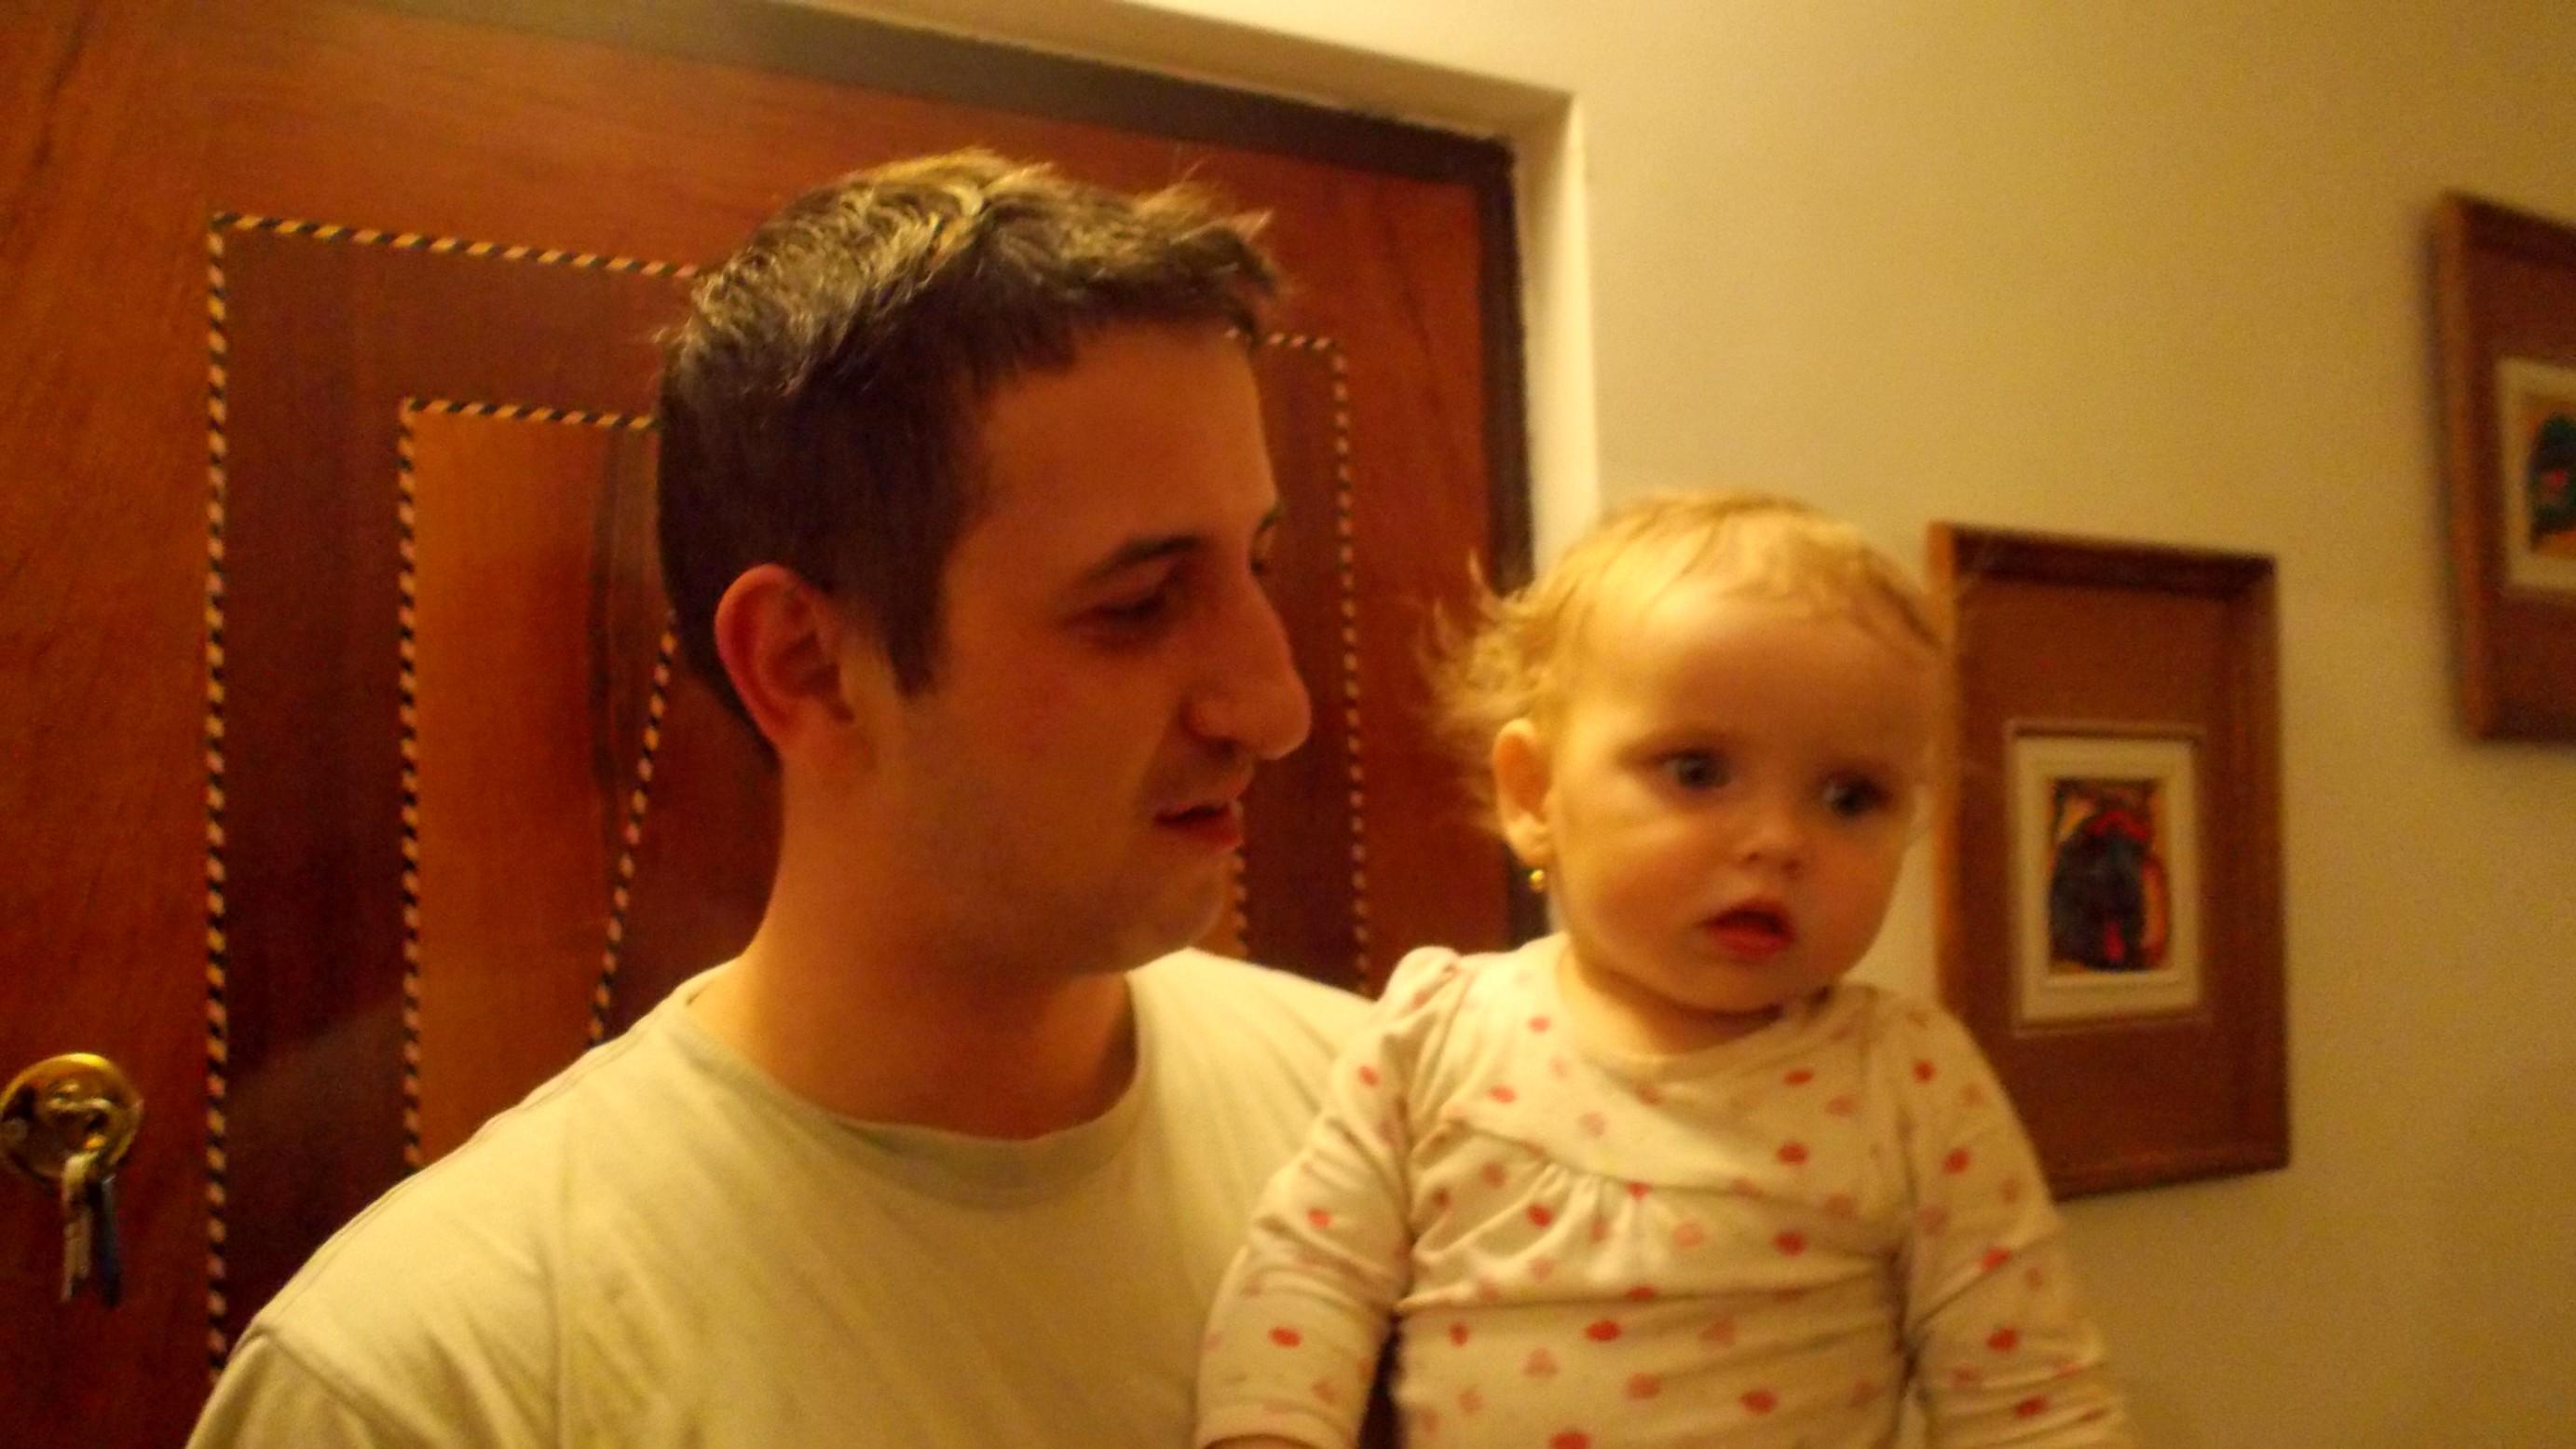 Ioana-Carina şi tatăl ei, Mihai-Octavian